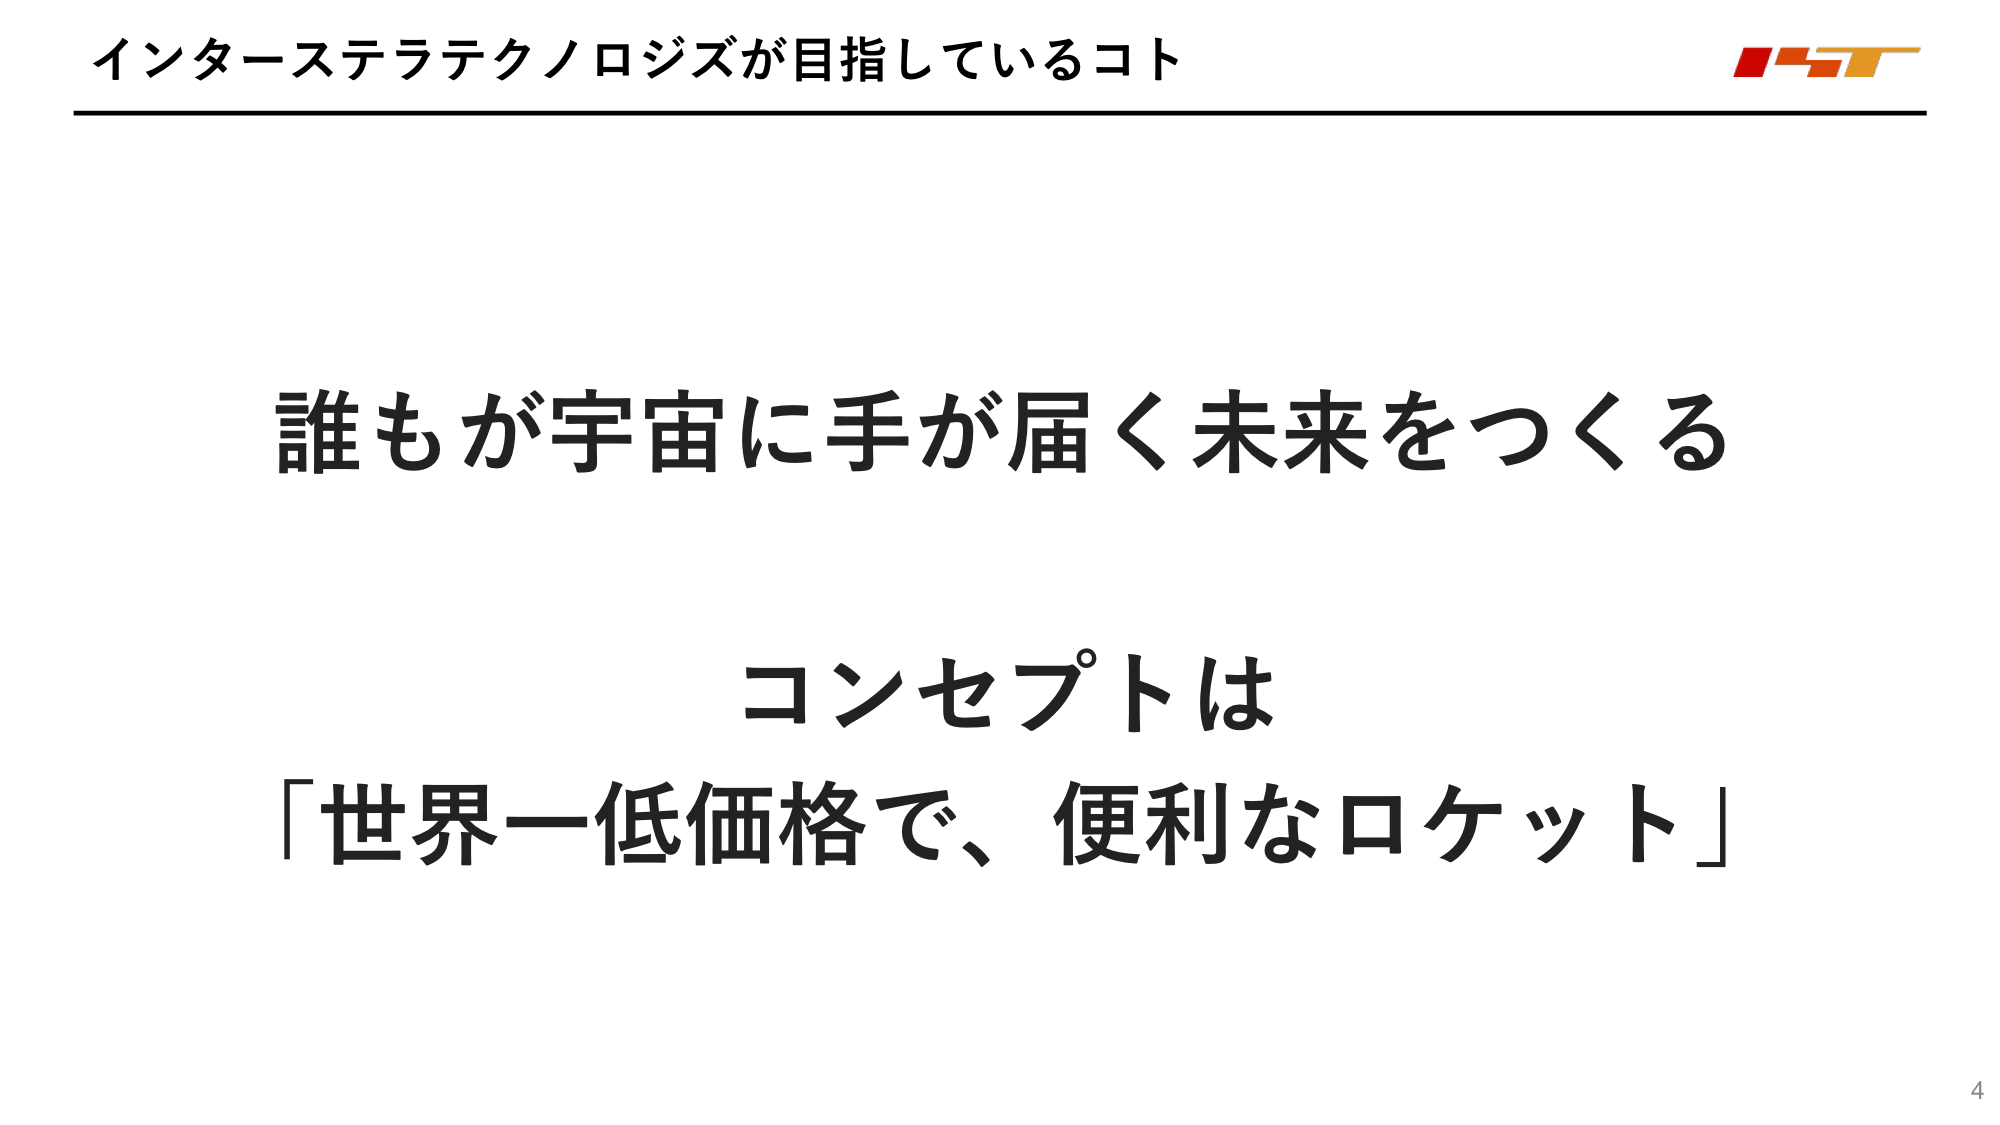 f:id:Imamura:20200603232719p:plain